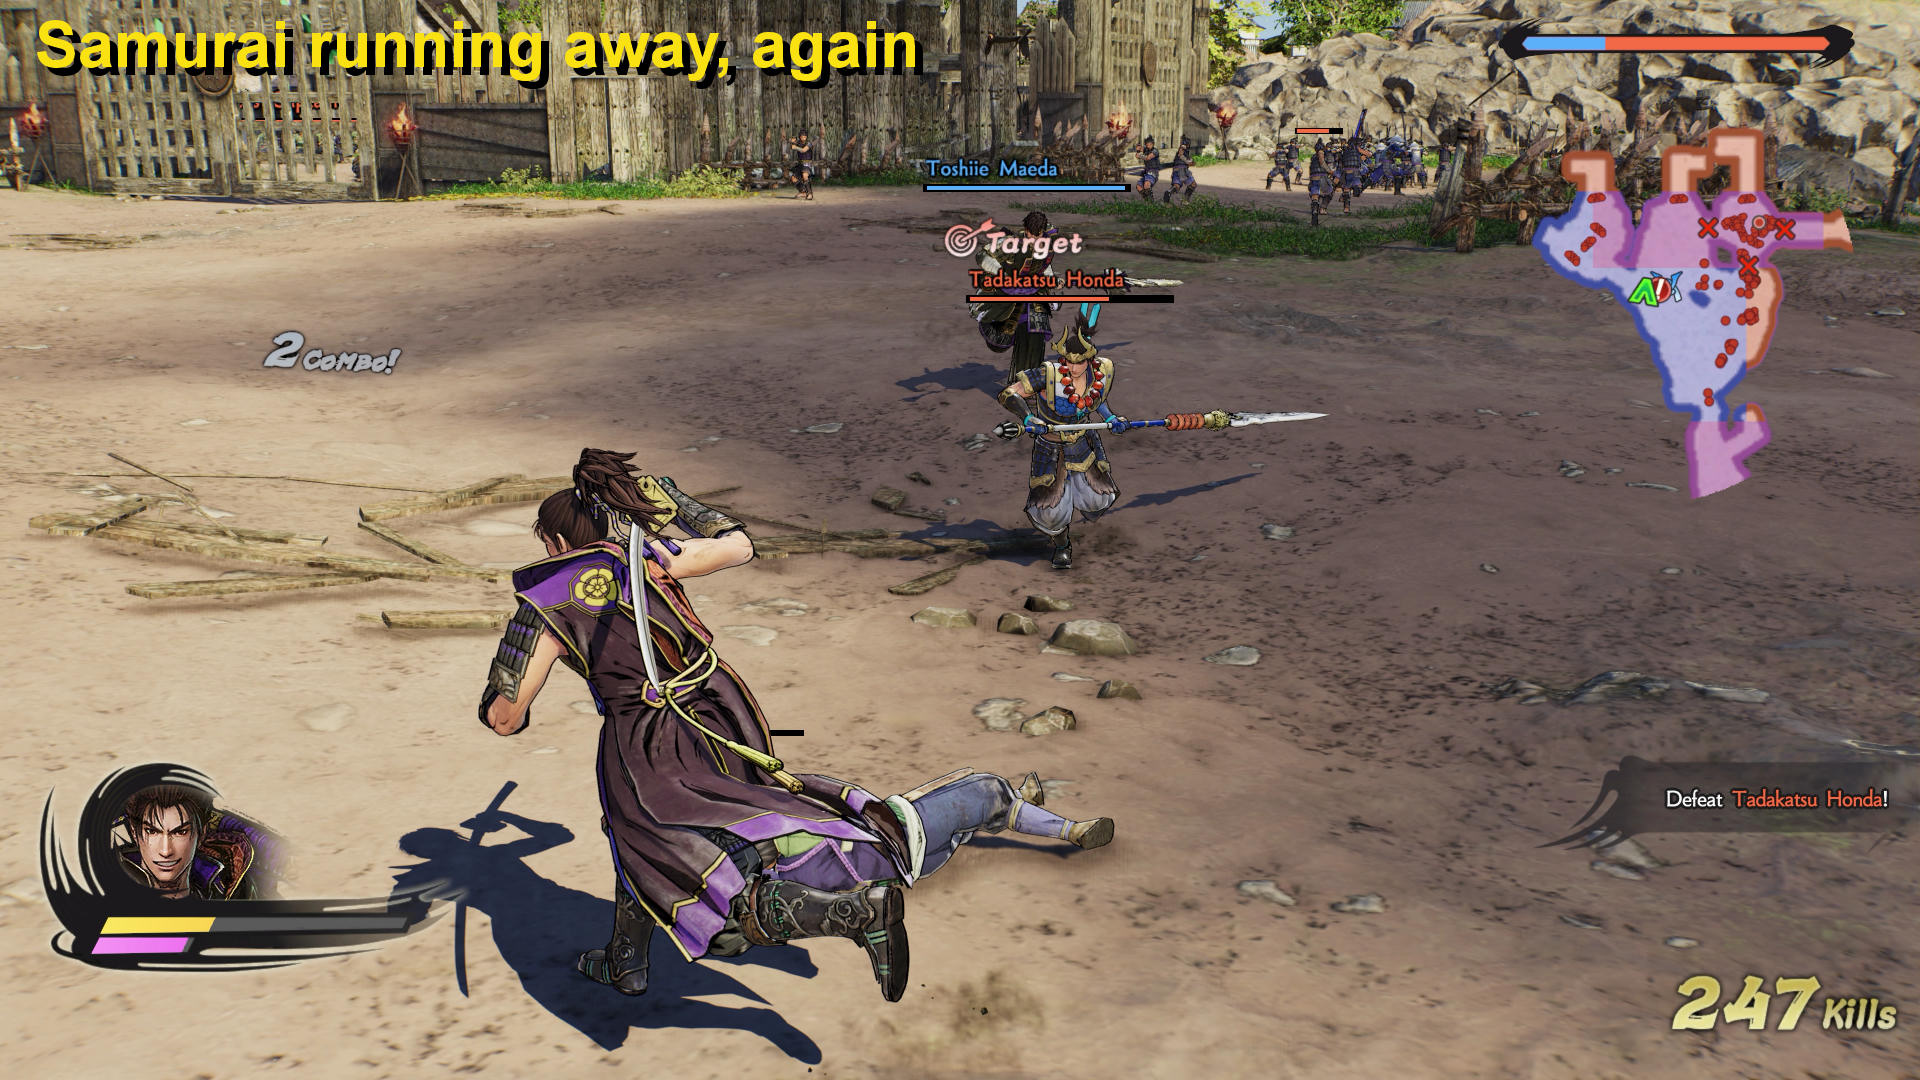 samuraiwarrior5-02.jpg